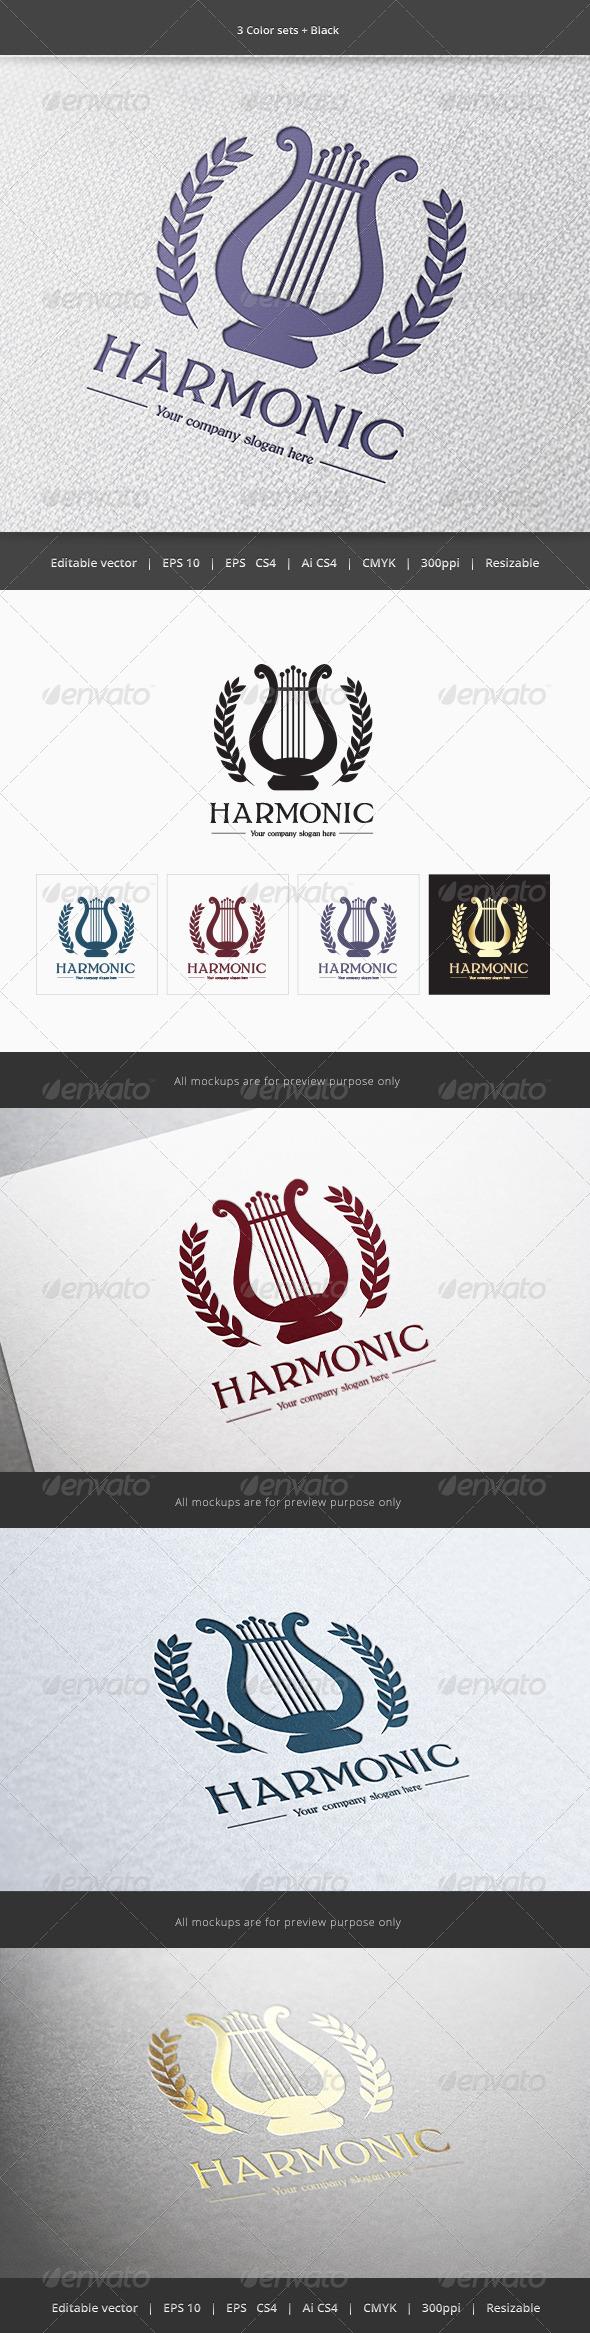 Harmonic Music Logo  - Objects Logo Templates